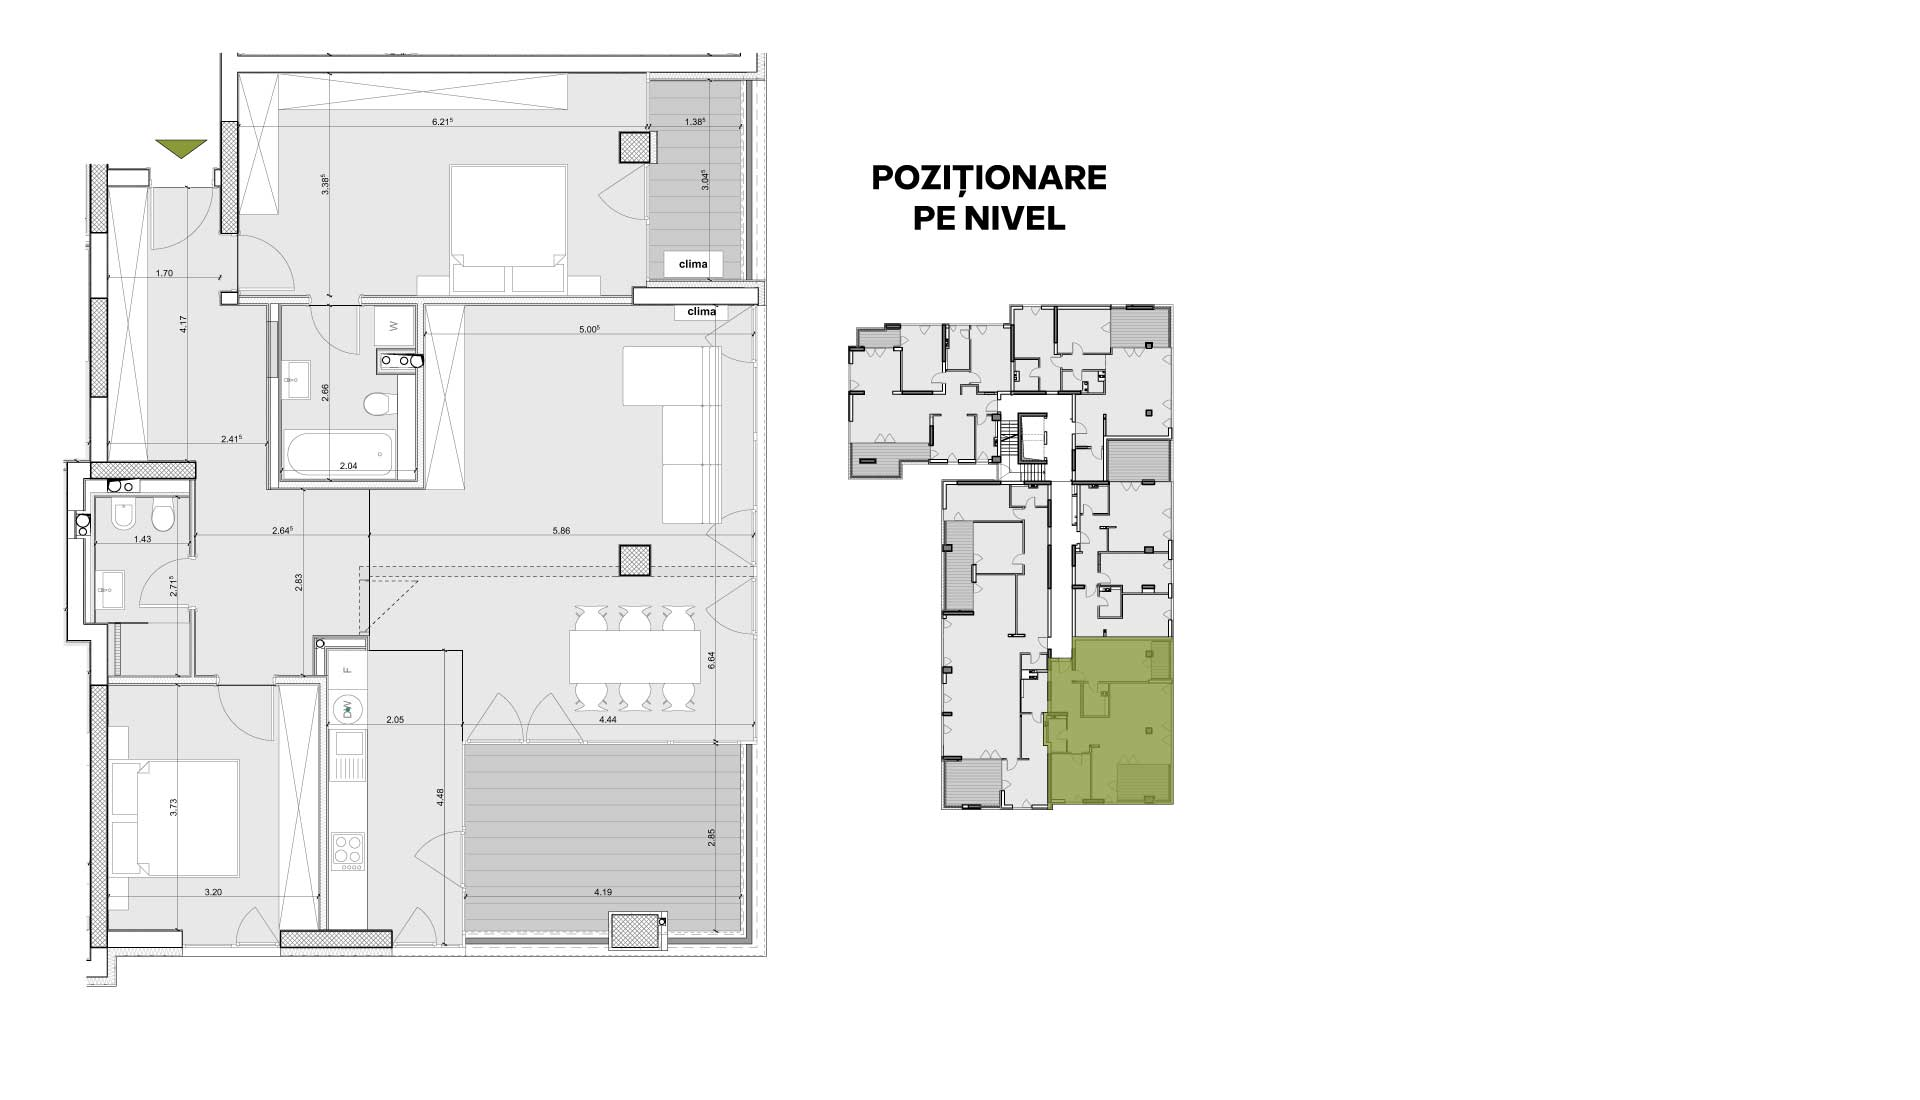 https://nord-one.ro/wp-content/uploads/2021/07/schita-penthouse-84.jpg